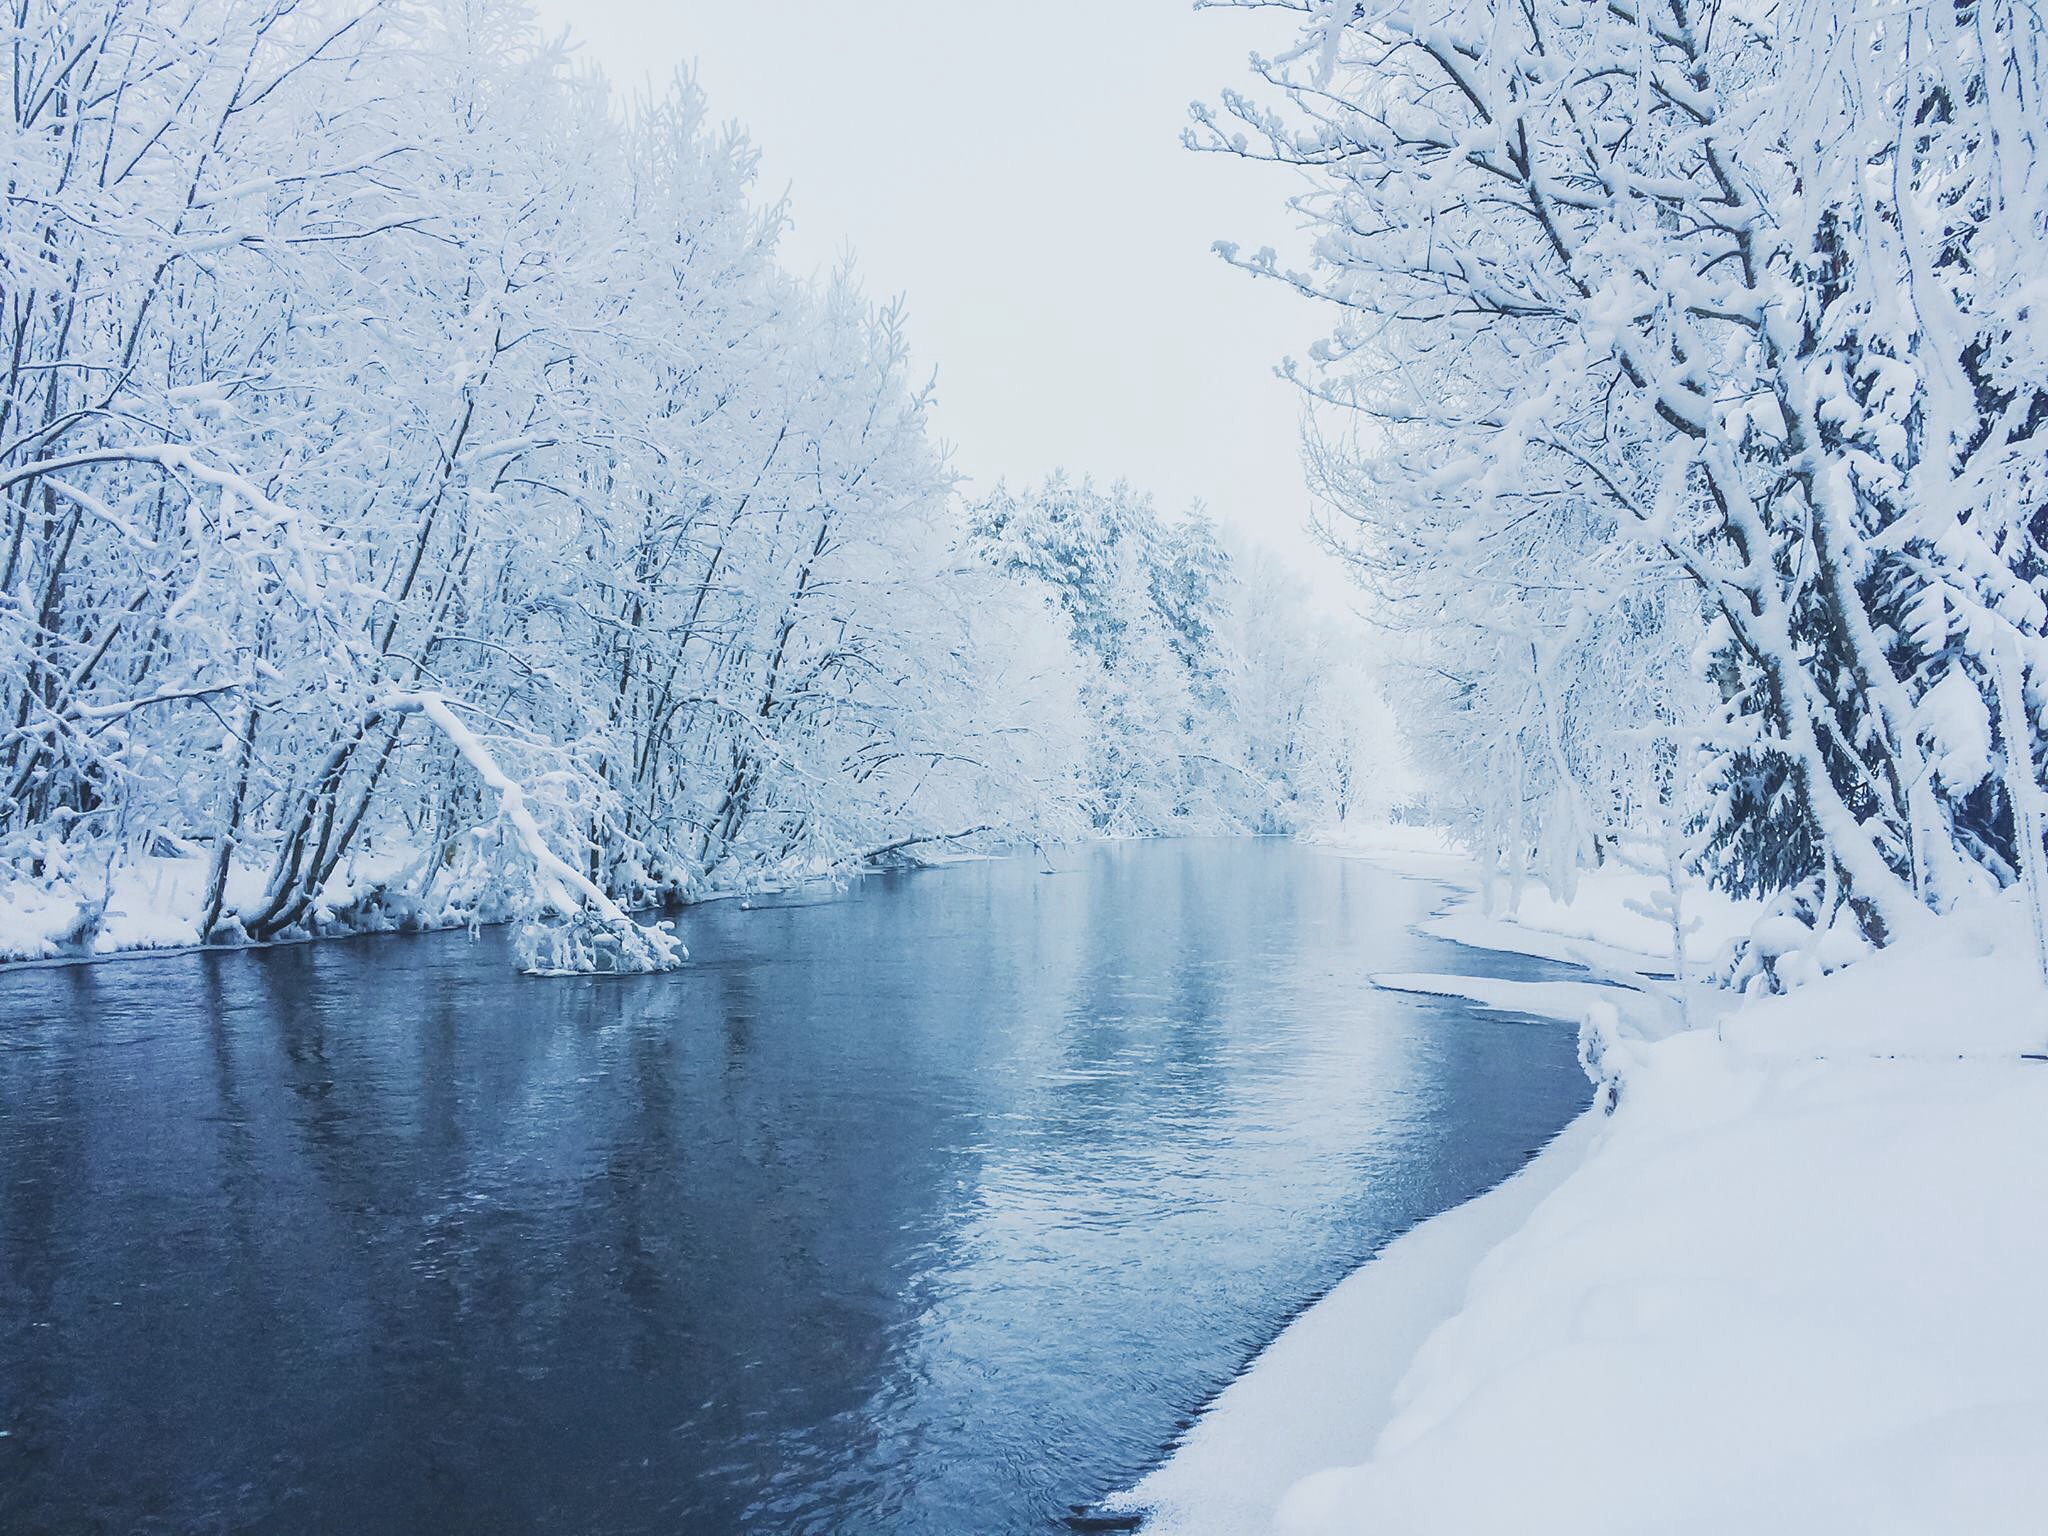 henrik.koskelo.winter.river.JPG